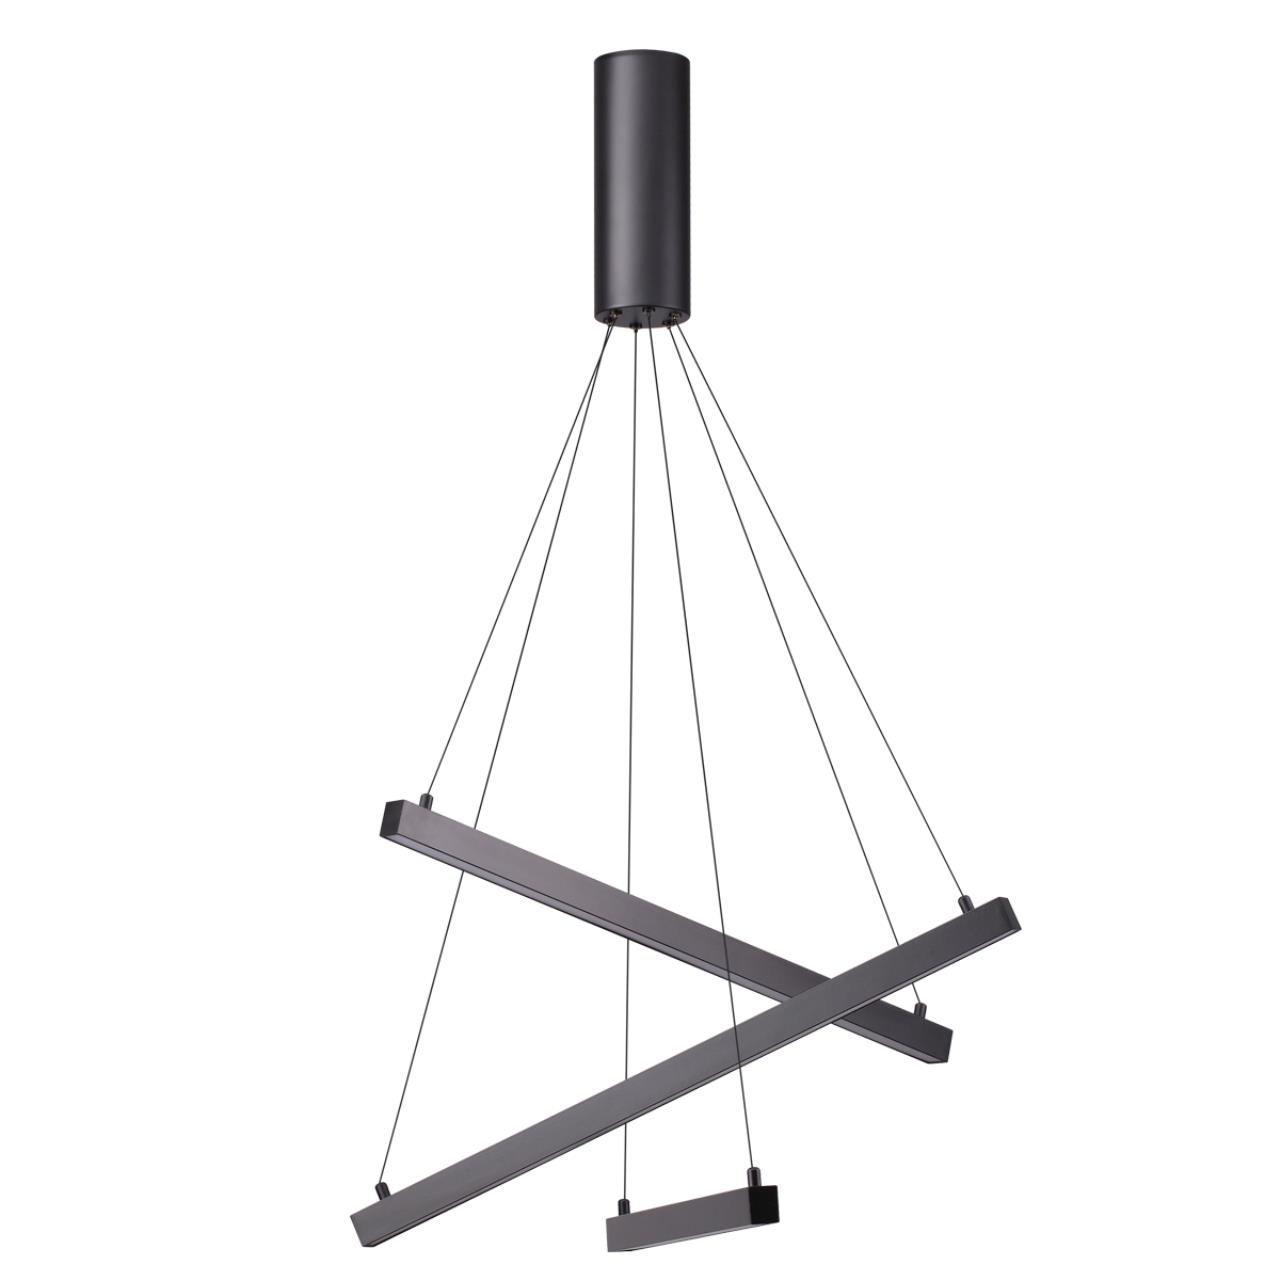 3860/39B L-VISION ODL20 33 черный/металл Подвесной светильник LED 3000K 39W 220V COMETA